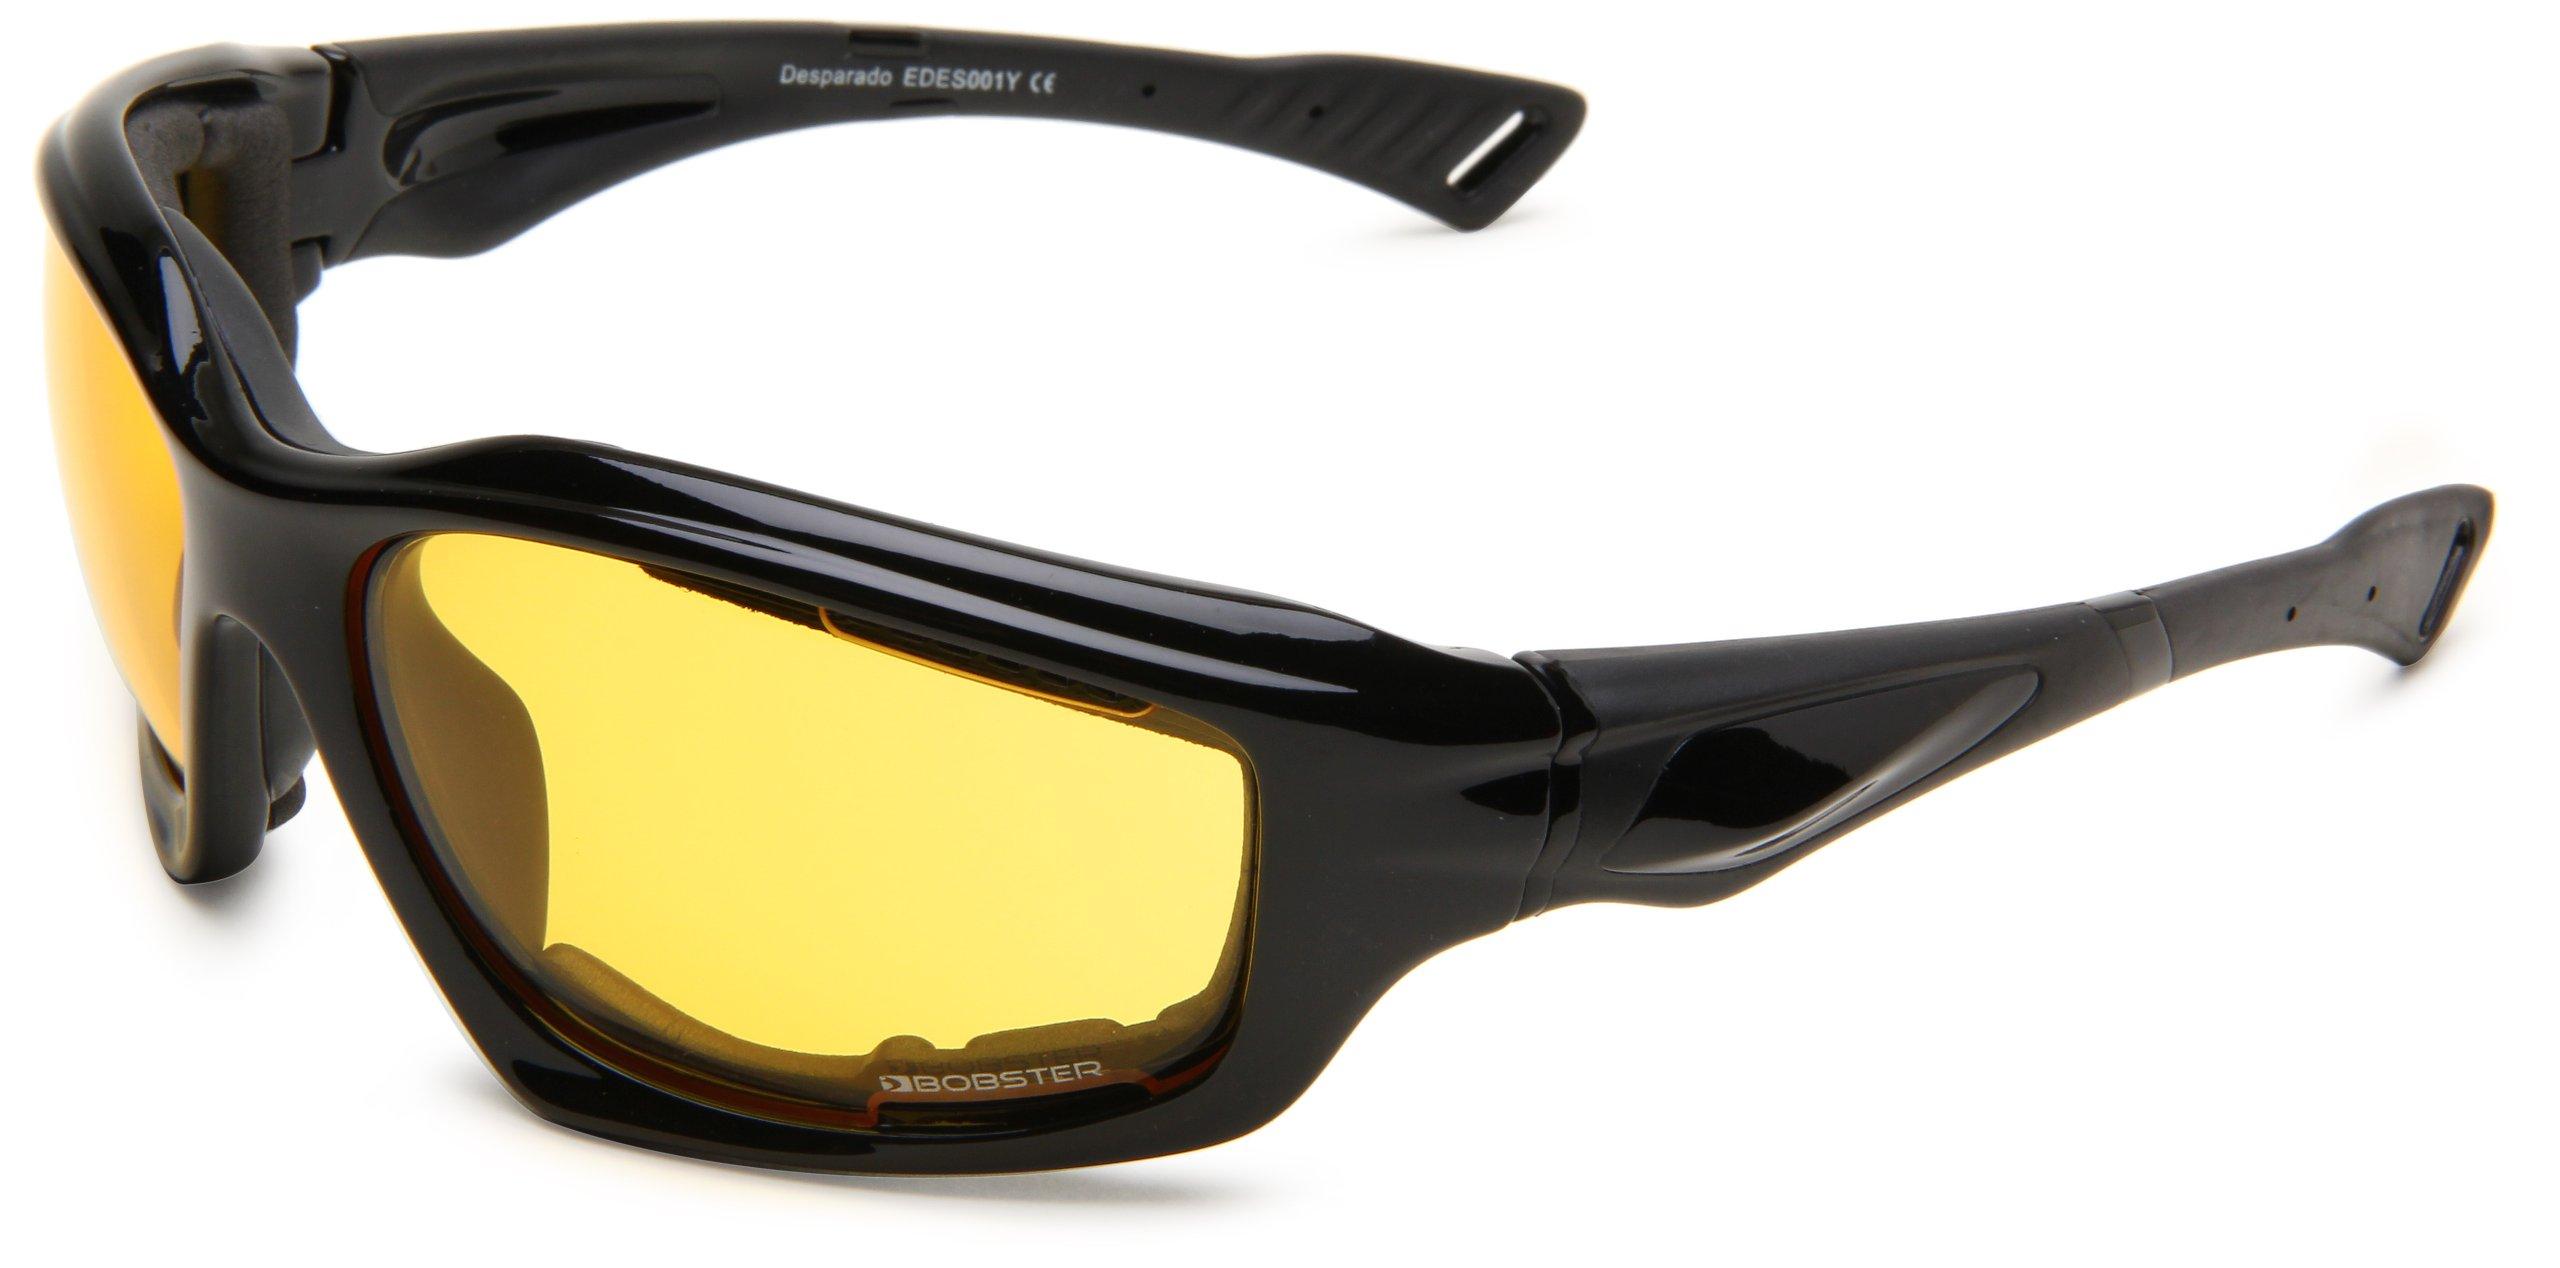 Bobster Desperado Square Sunglasses, Black Frame/Yellow Anti-Fog Lens with Foam